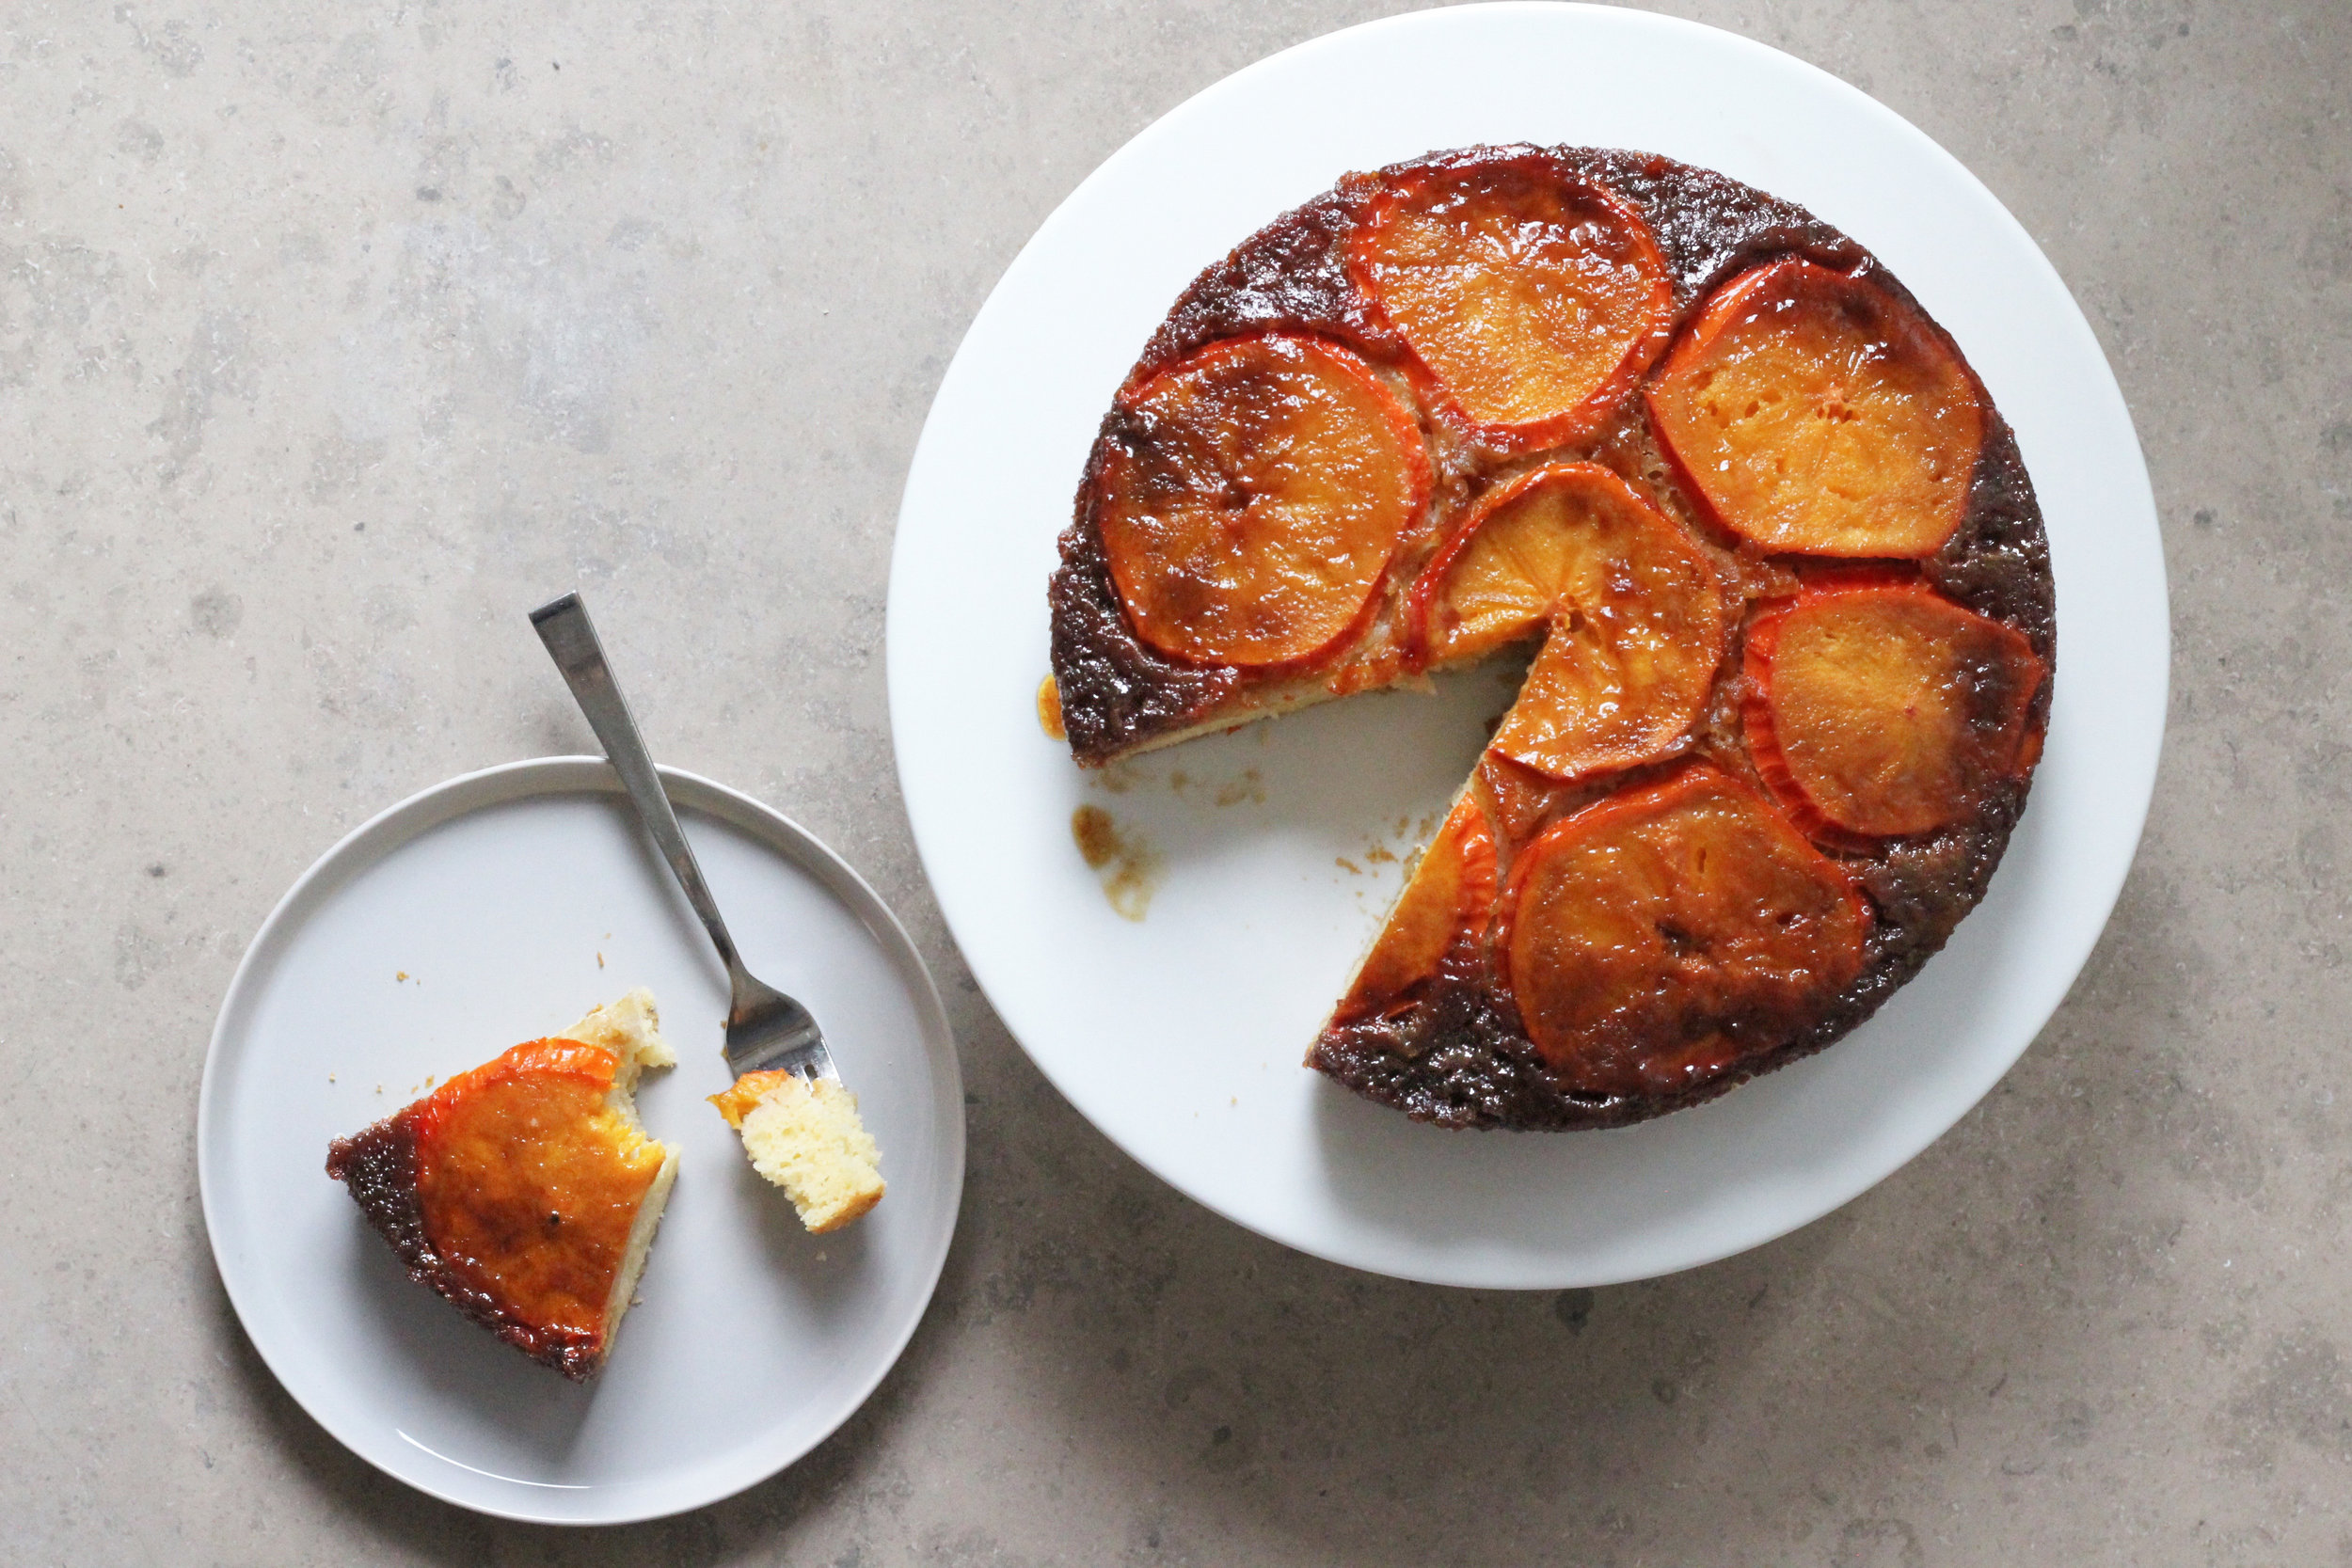 persimmon upside-down cake